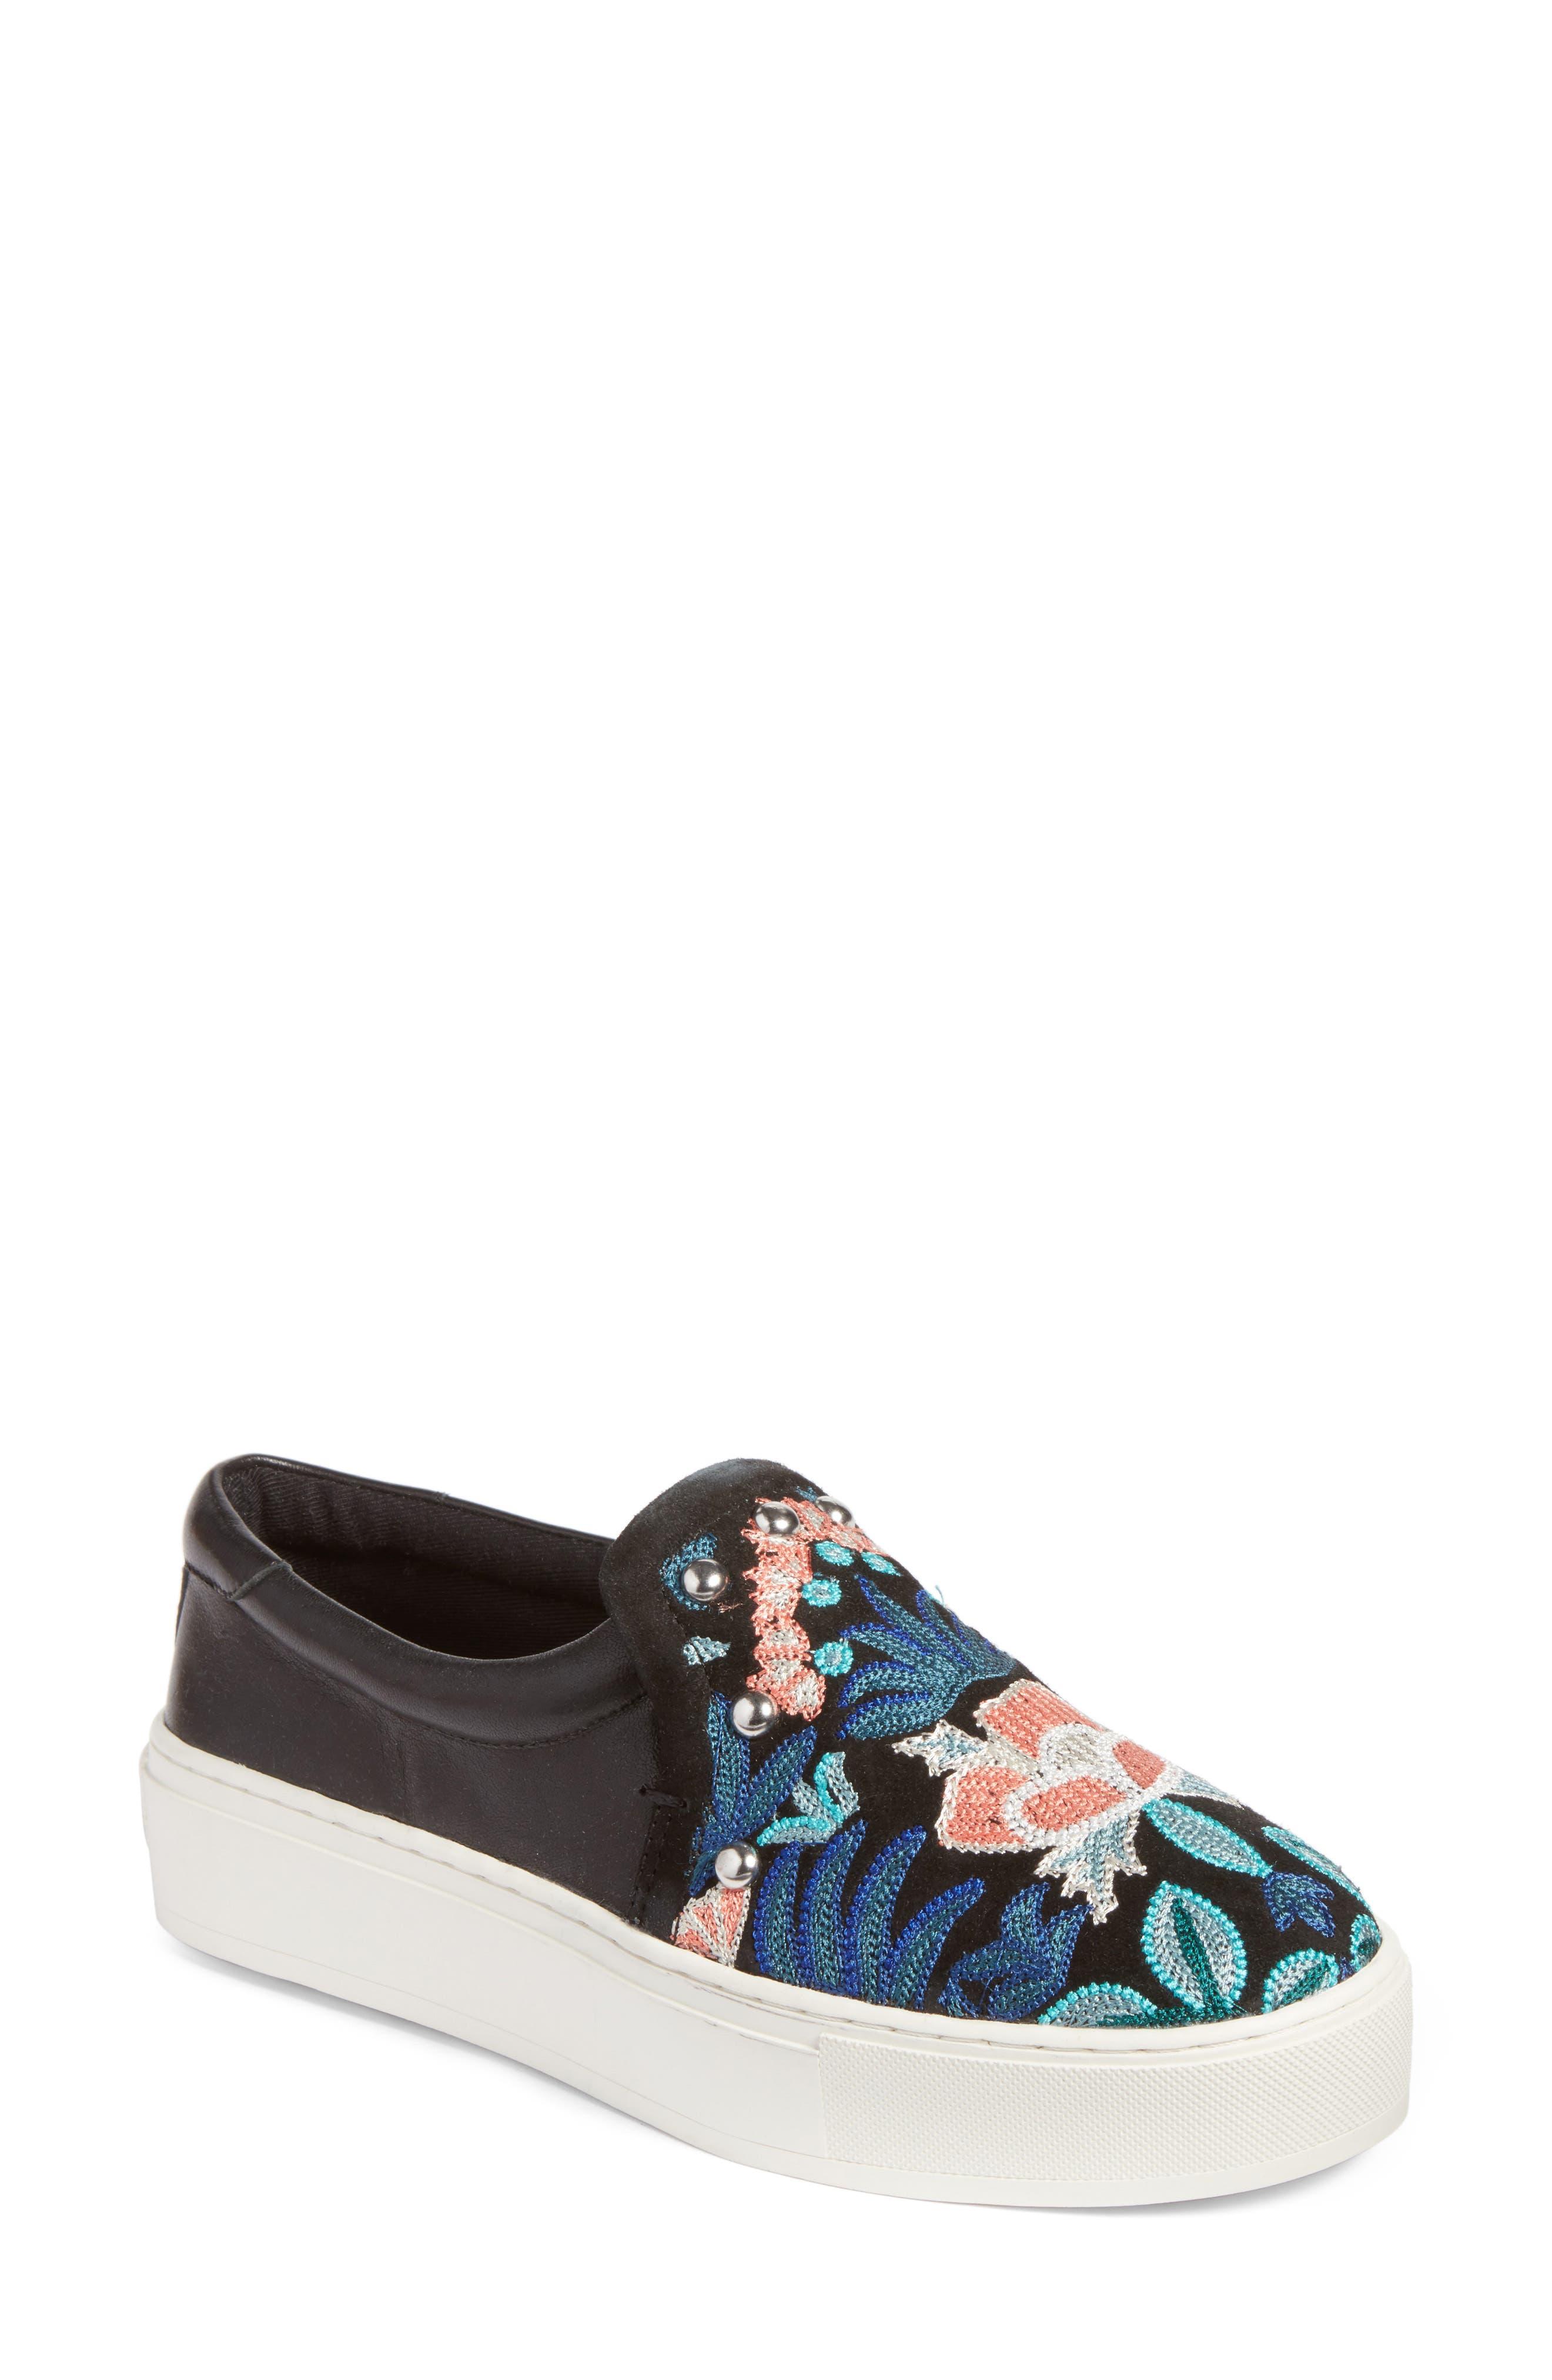 Alternate Image 1 Selected - Rebecca Minkoff Noelle Embellished Slip-On Platform Sneaker (Women)